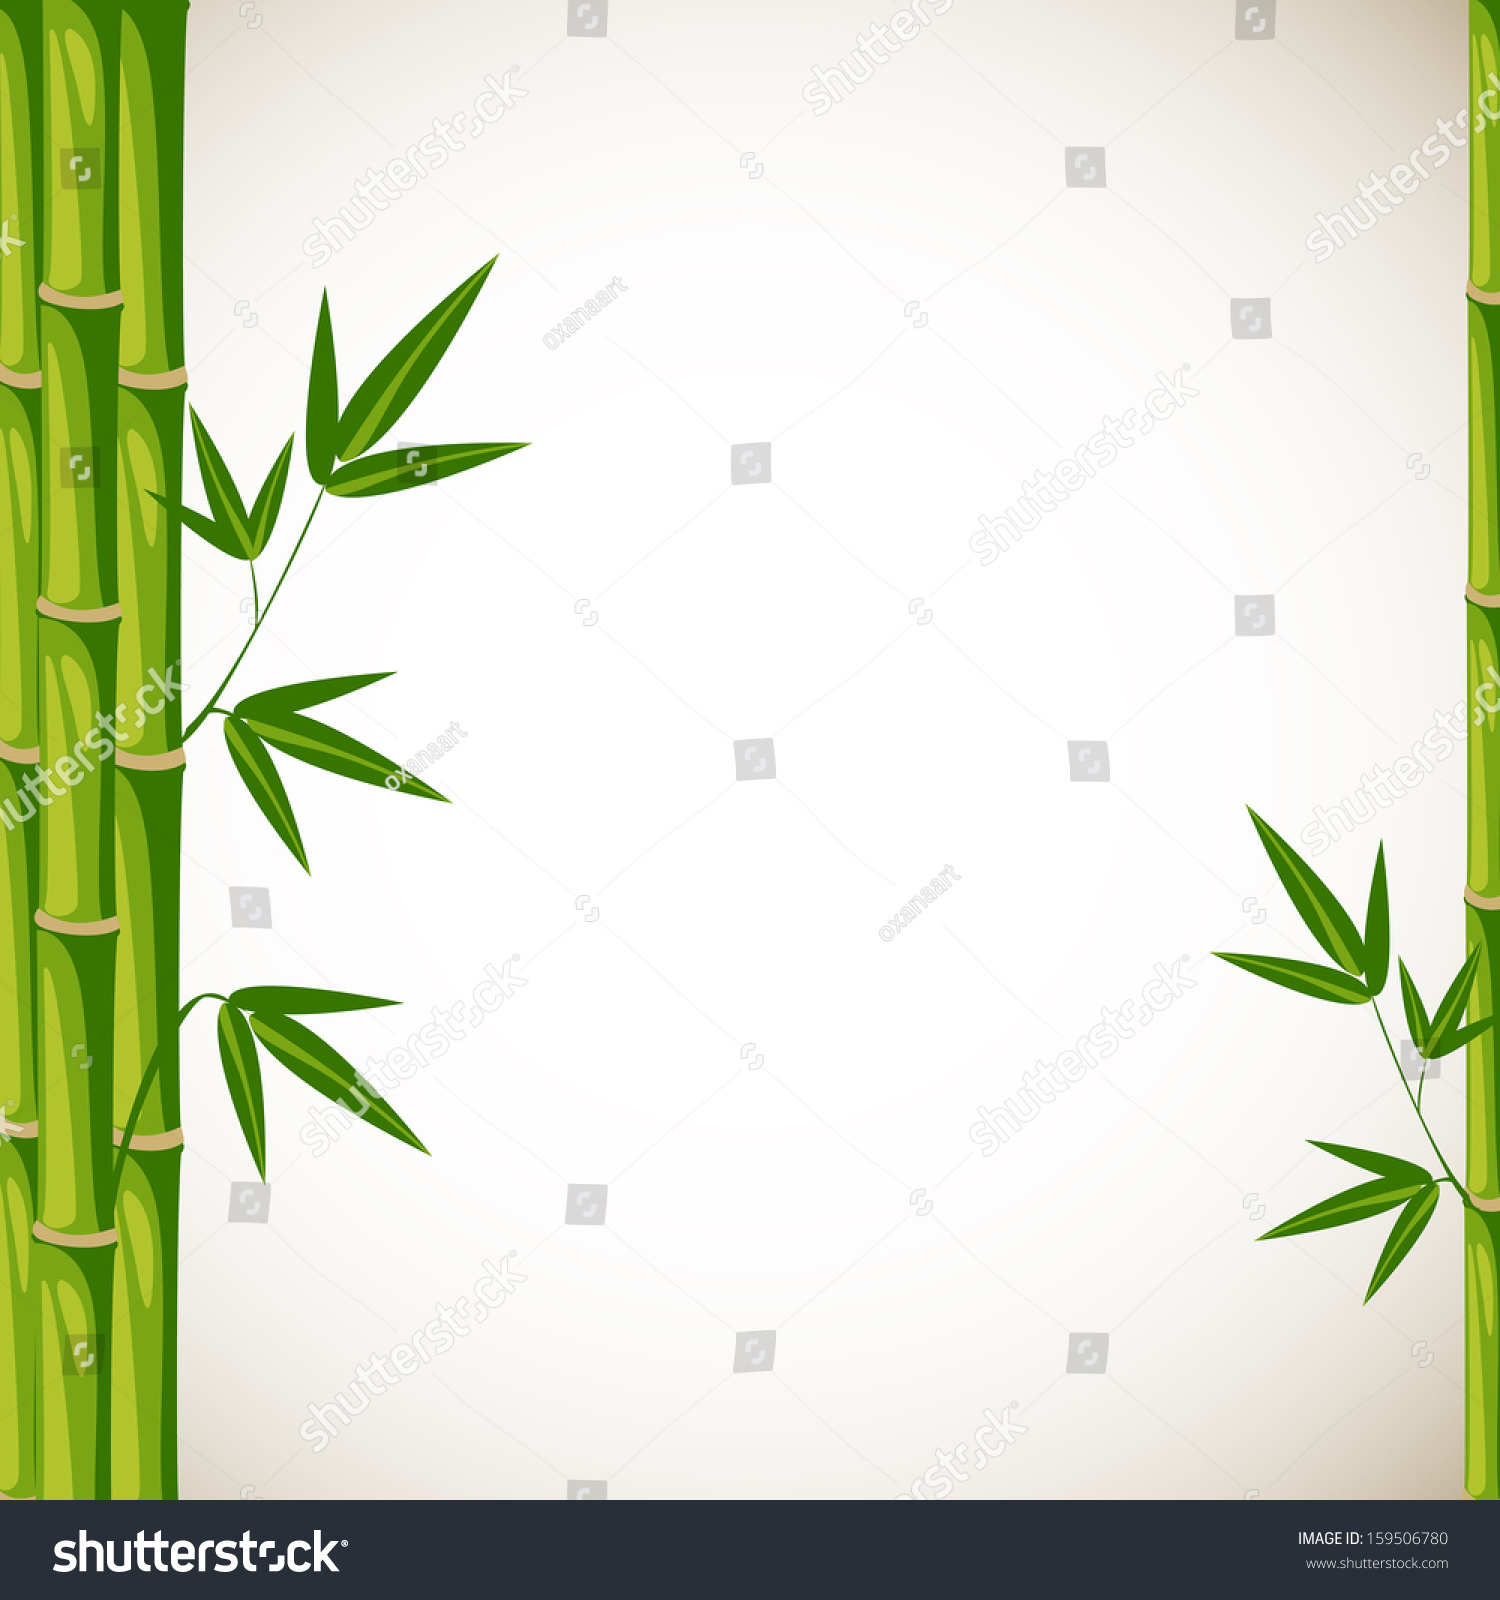 bamboo template background stock illustration 159506780 shutterstock